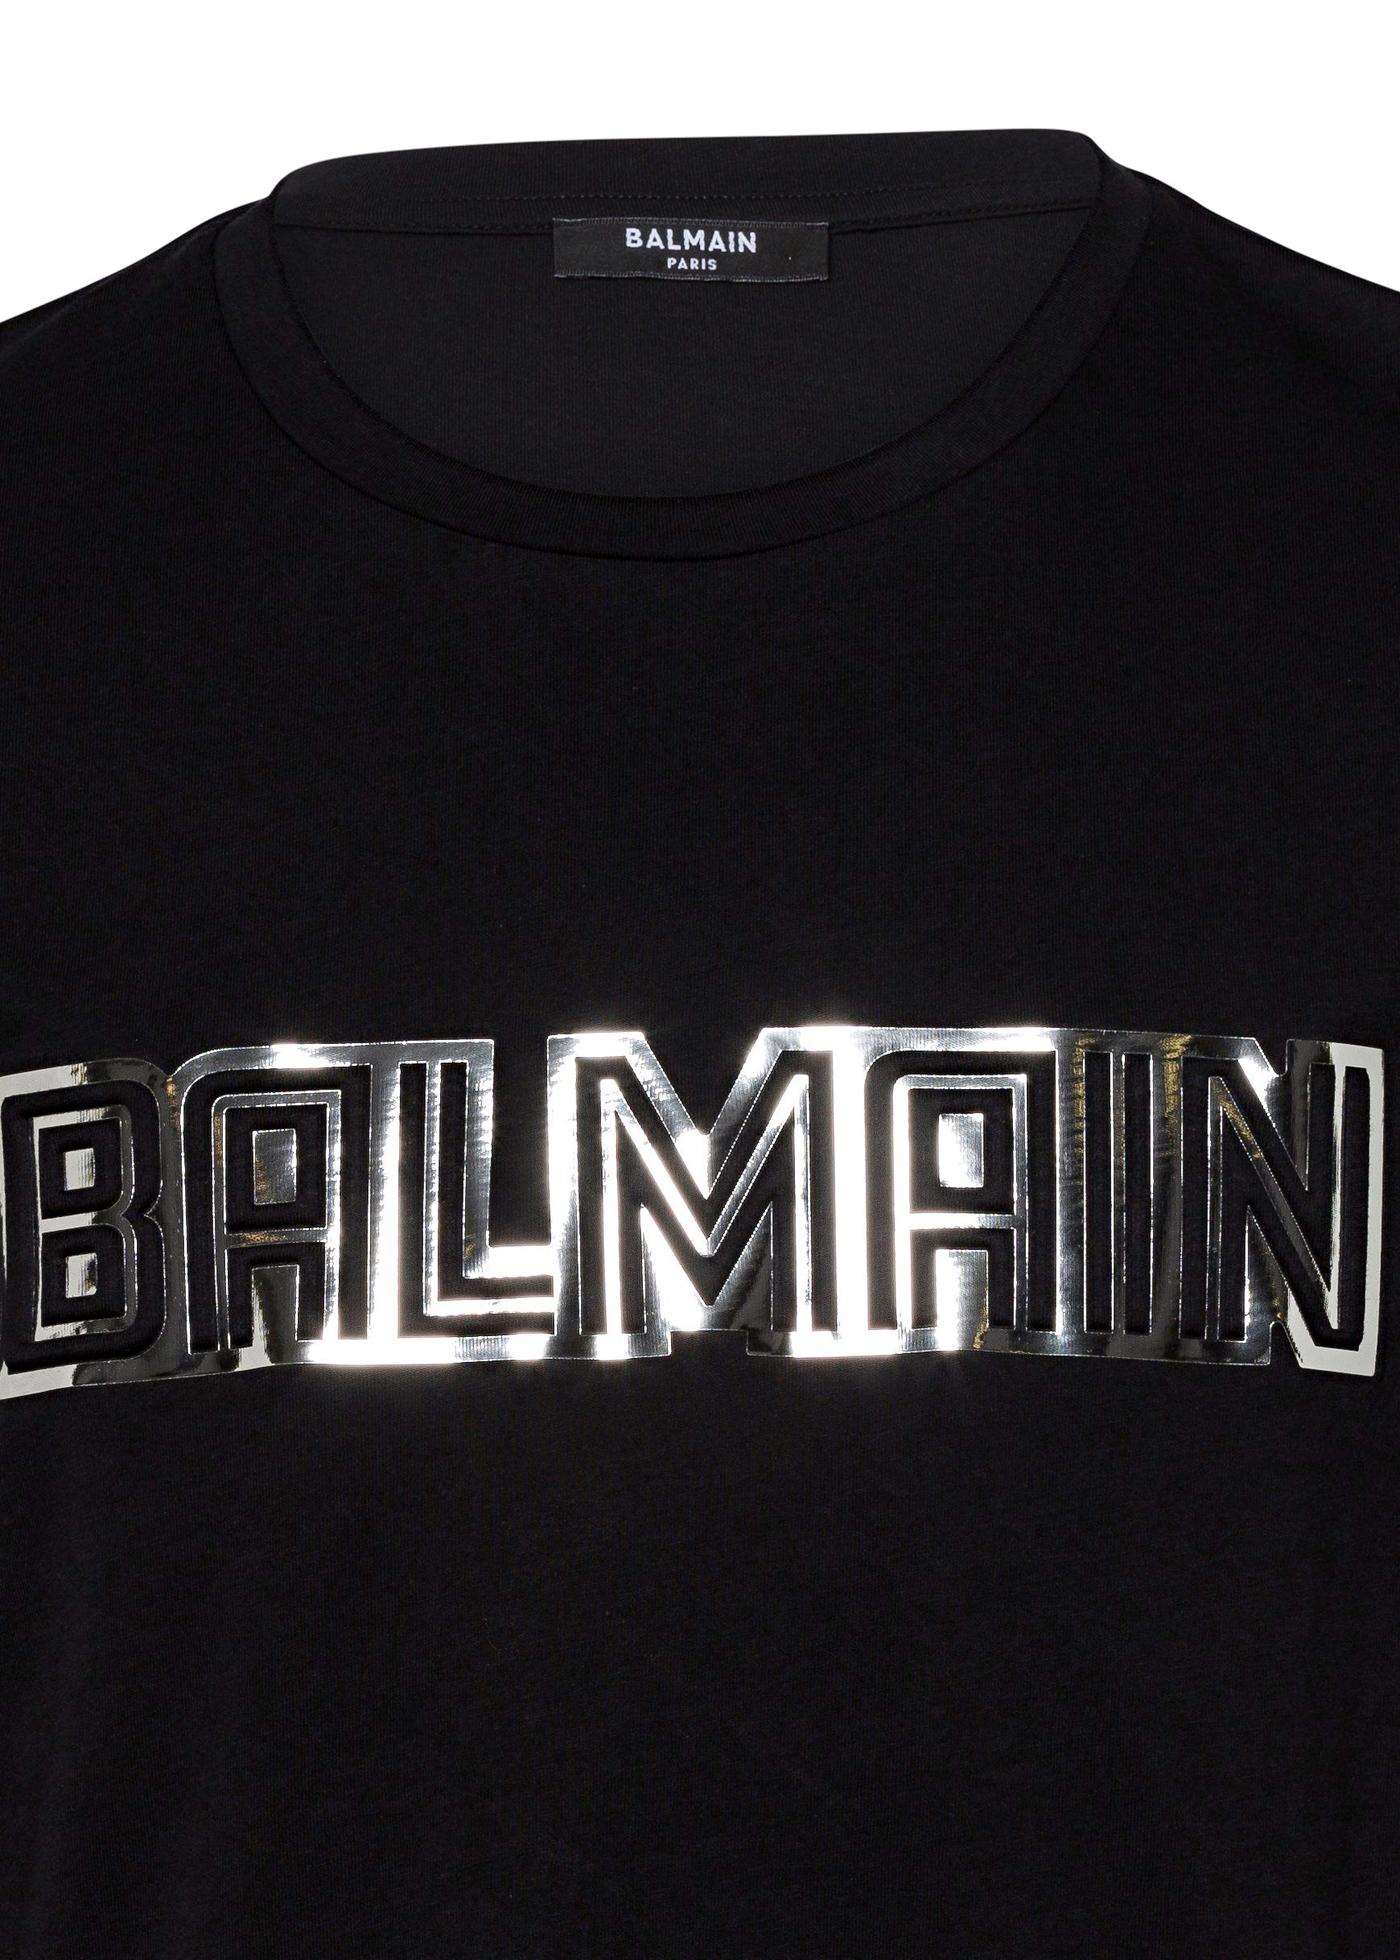 METTALIC BALMAIN EMBOSSED T-SHIRT image number 2